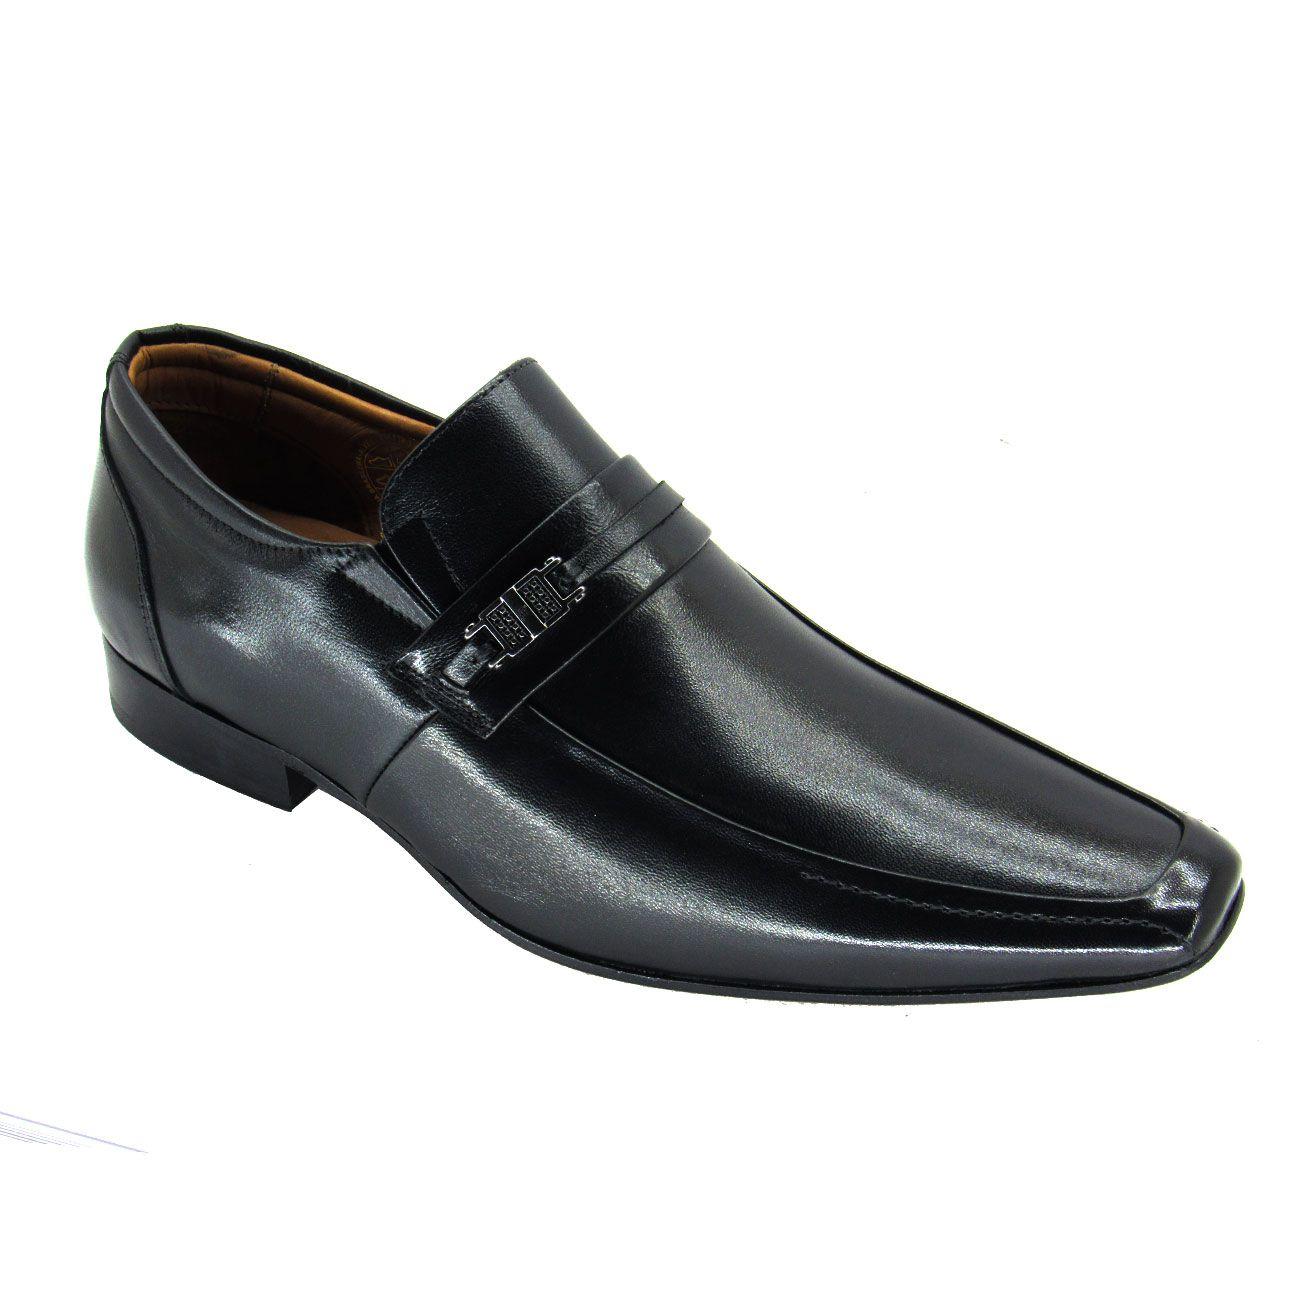 Sapato Social Masculino Sola de Couro Berlin Jota Pe 72811 Pelica